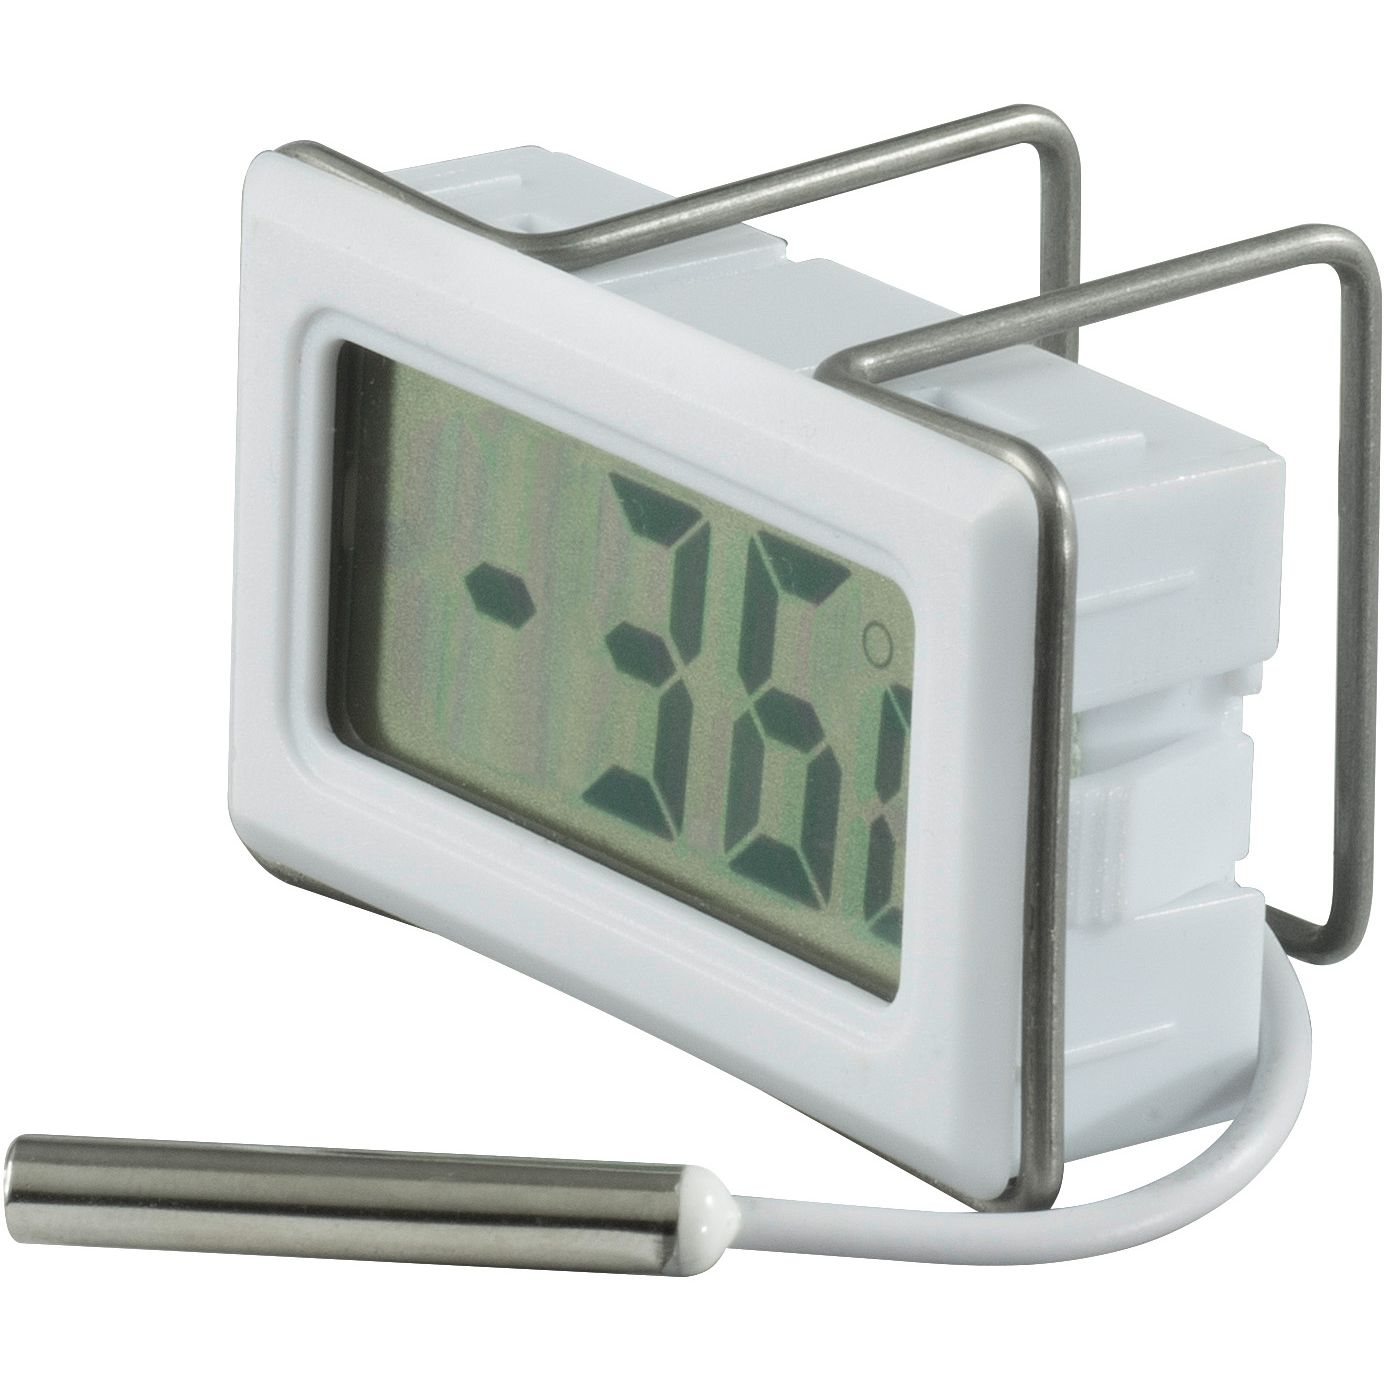 REMS 131116 R Termometer LCD digital